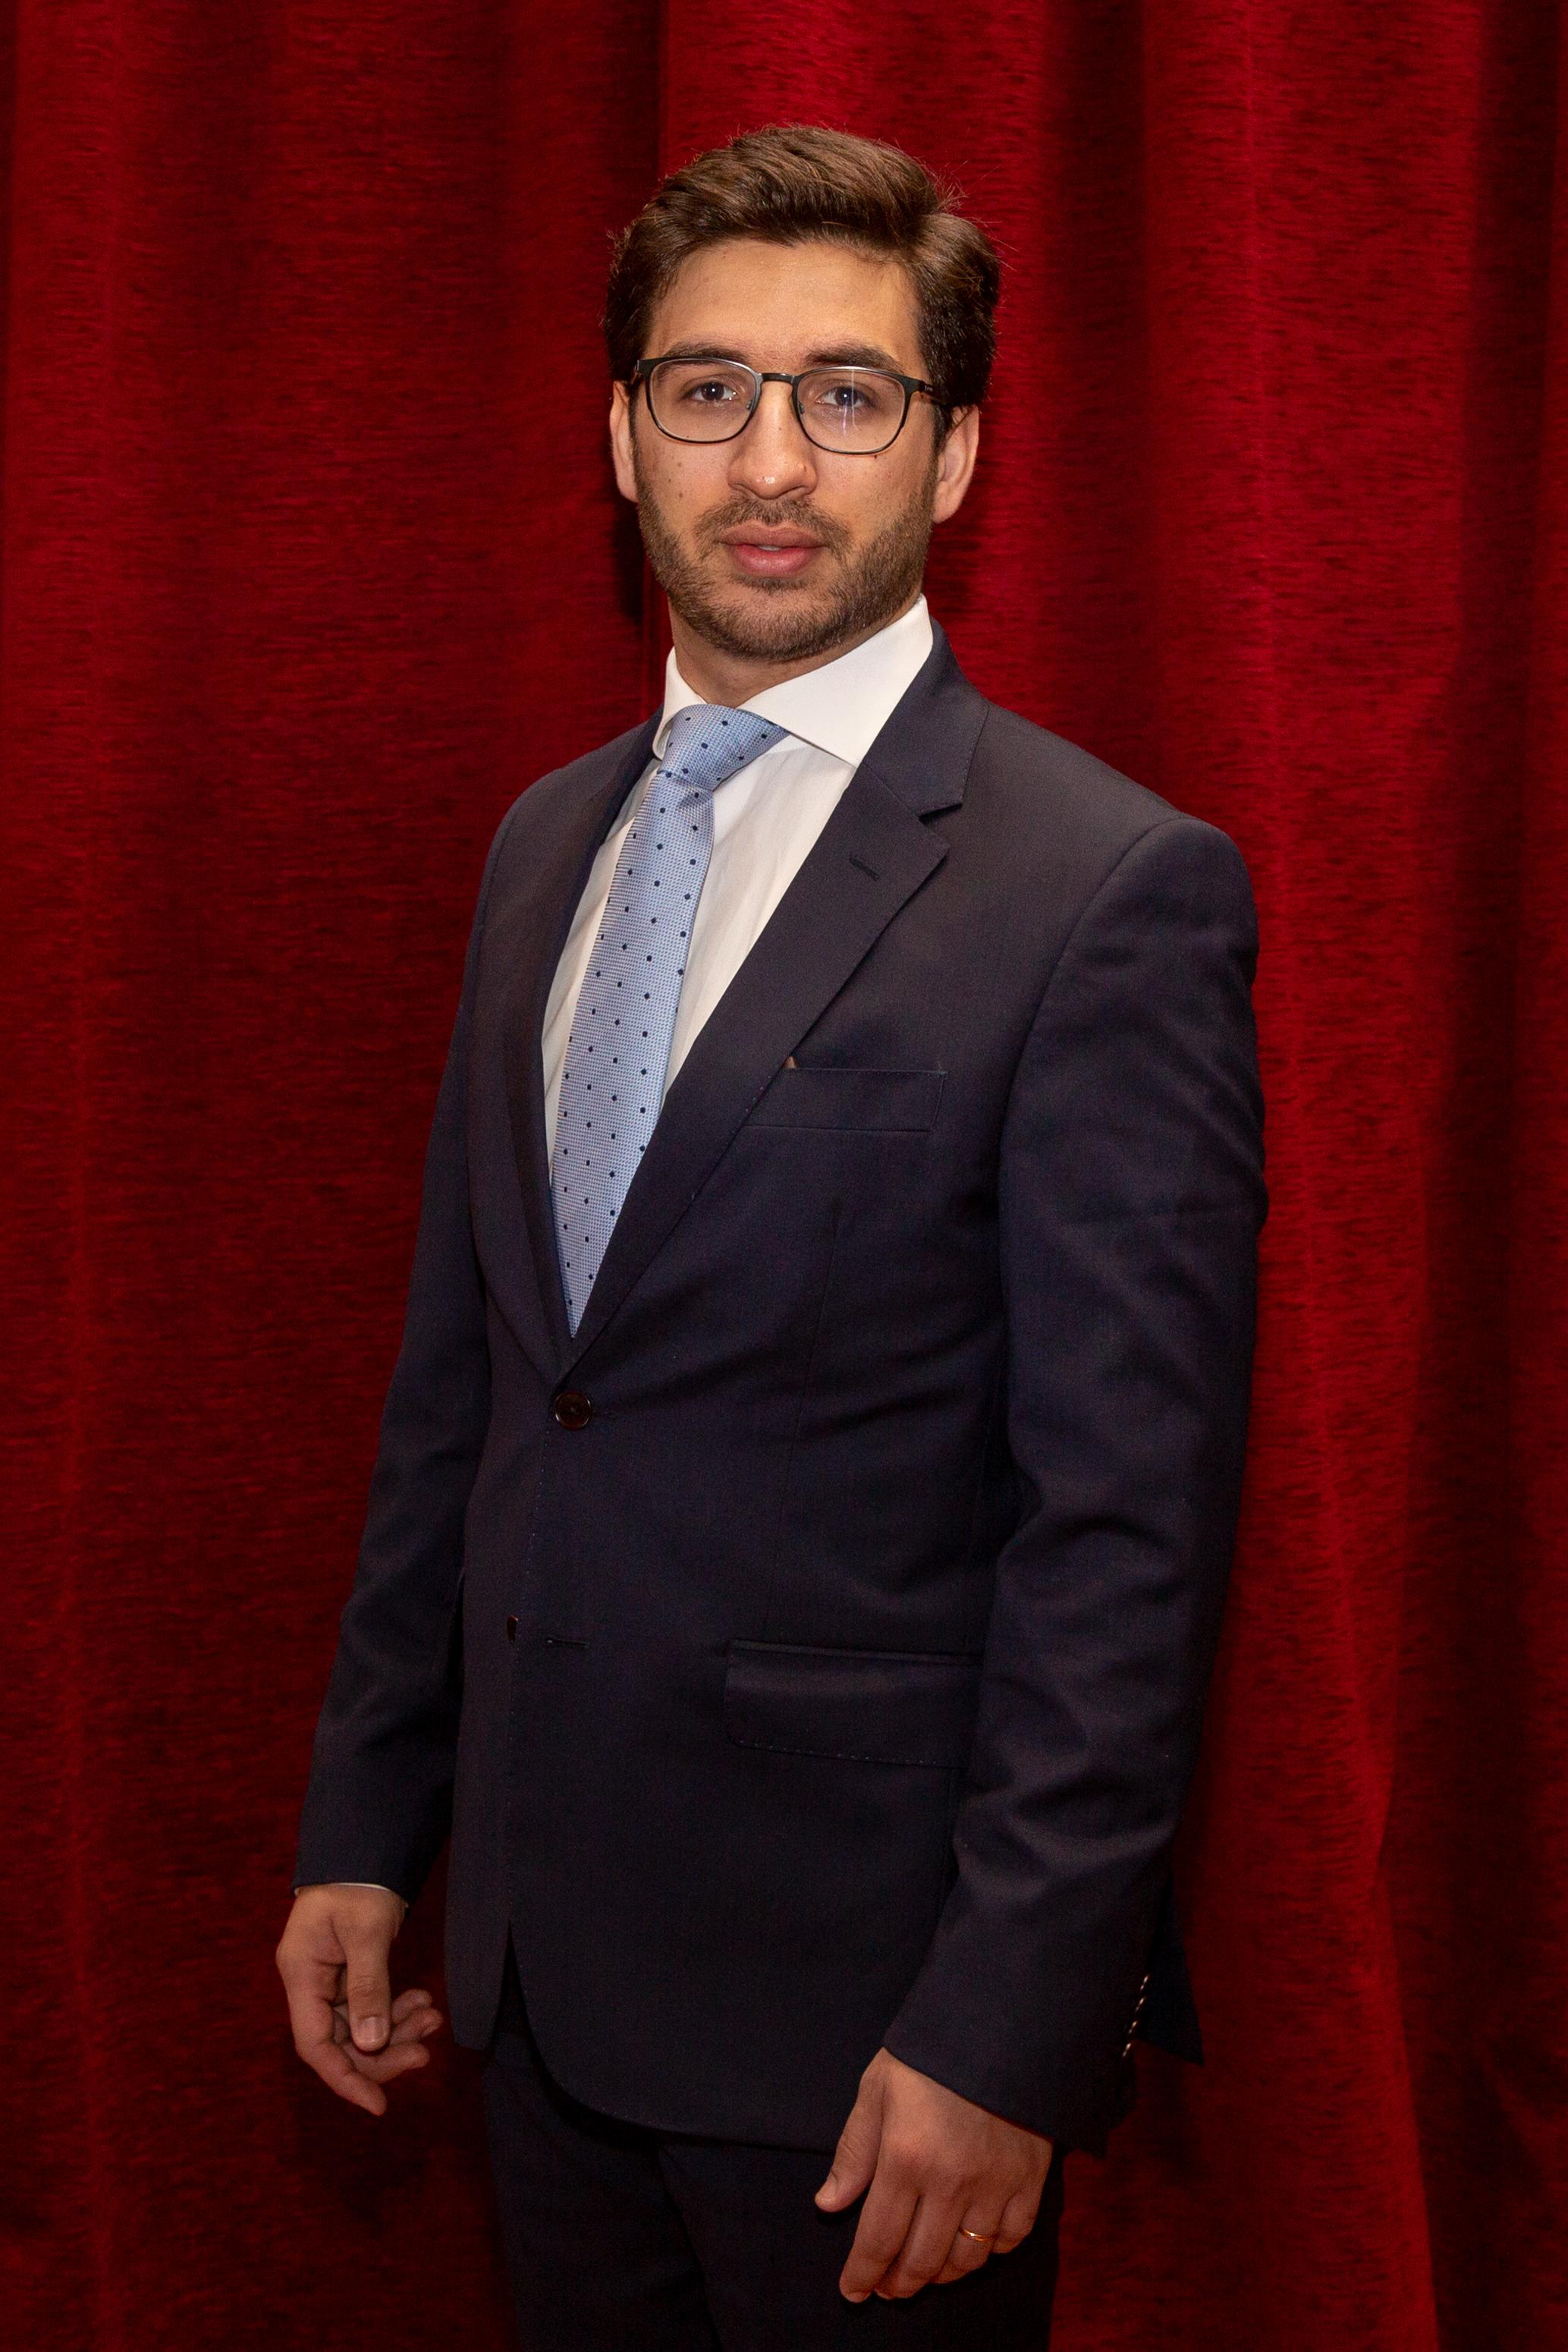 Elias Prudêncio